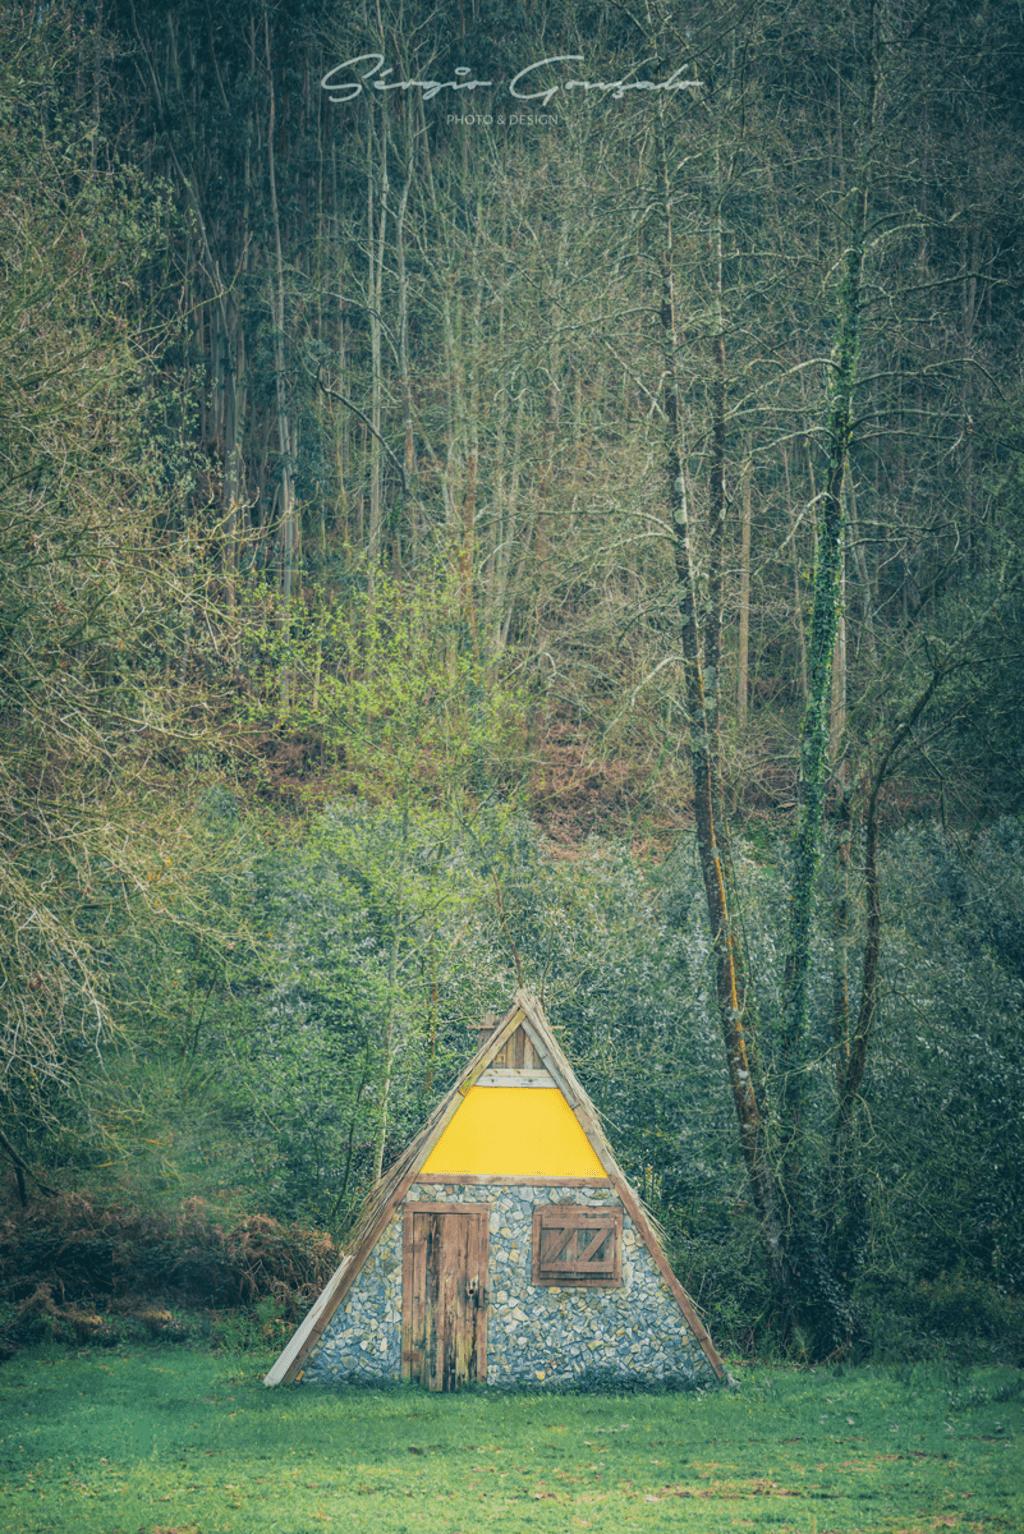 Living in the nature via Through the eyes of Sérgio Gonçallo